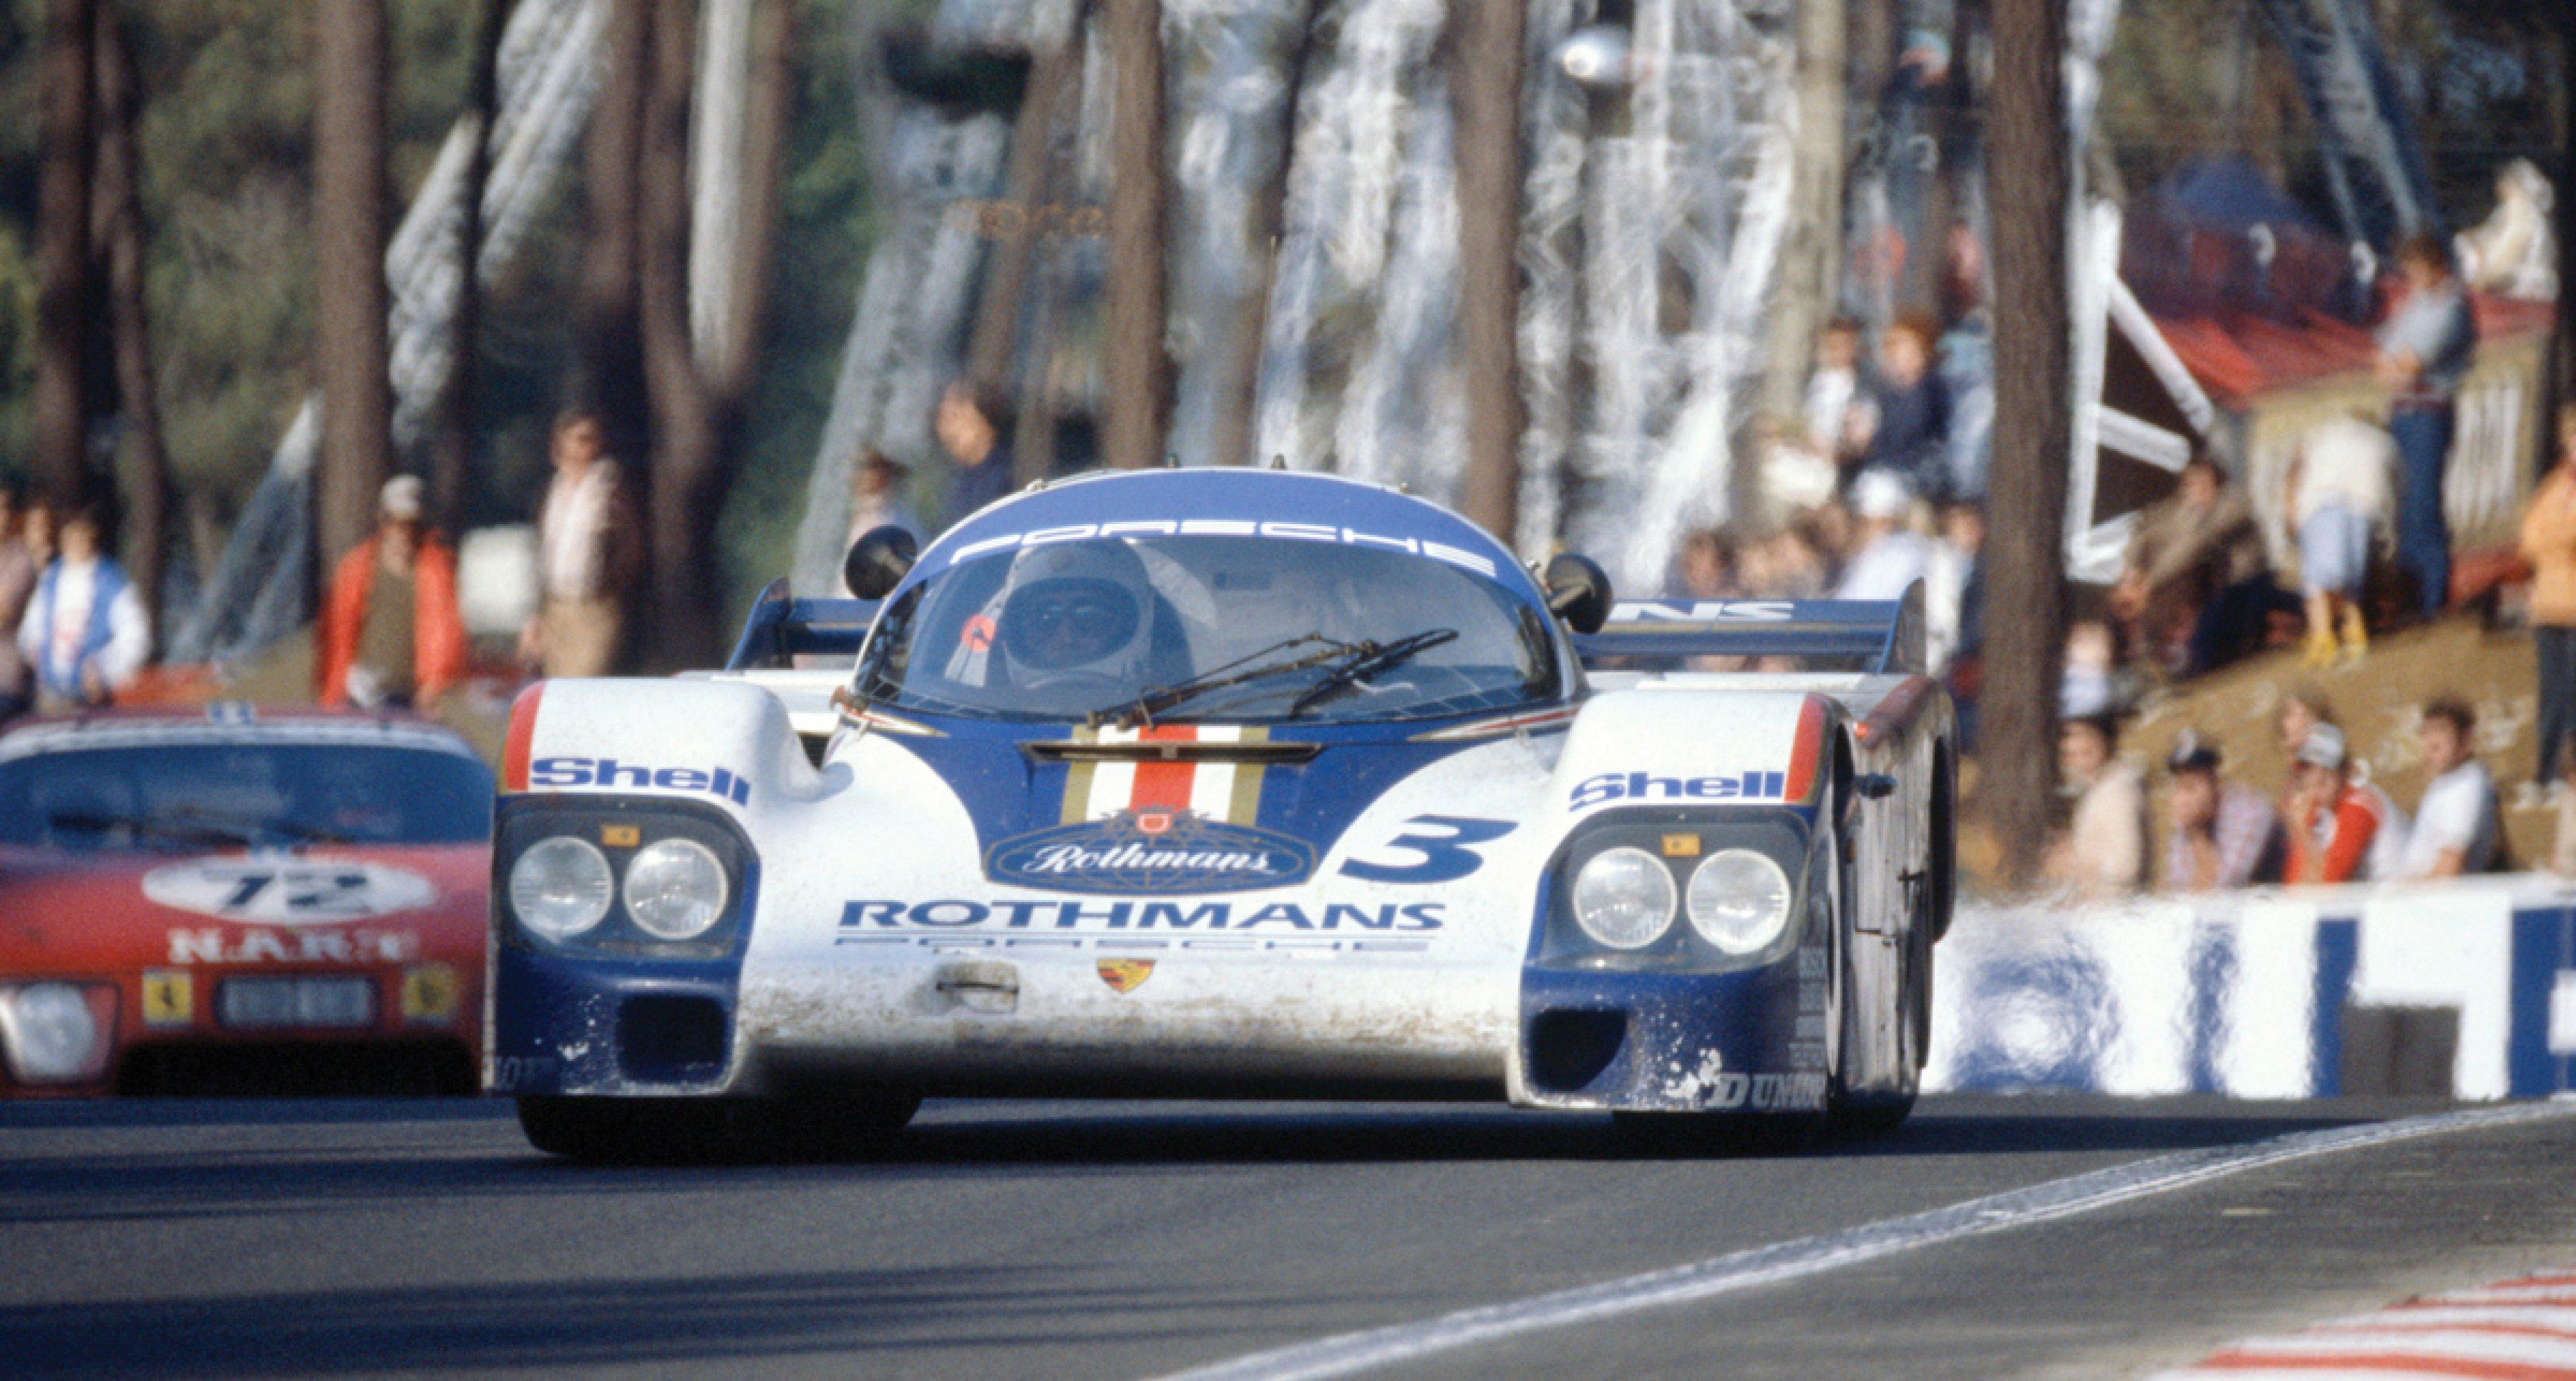 Lot 29: 1982 Porsche 956 Group C Sports-Prototype € 2.100.000 - 2.900.000